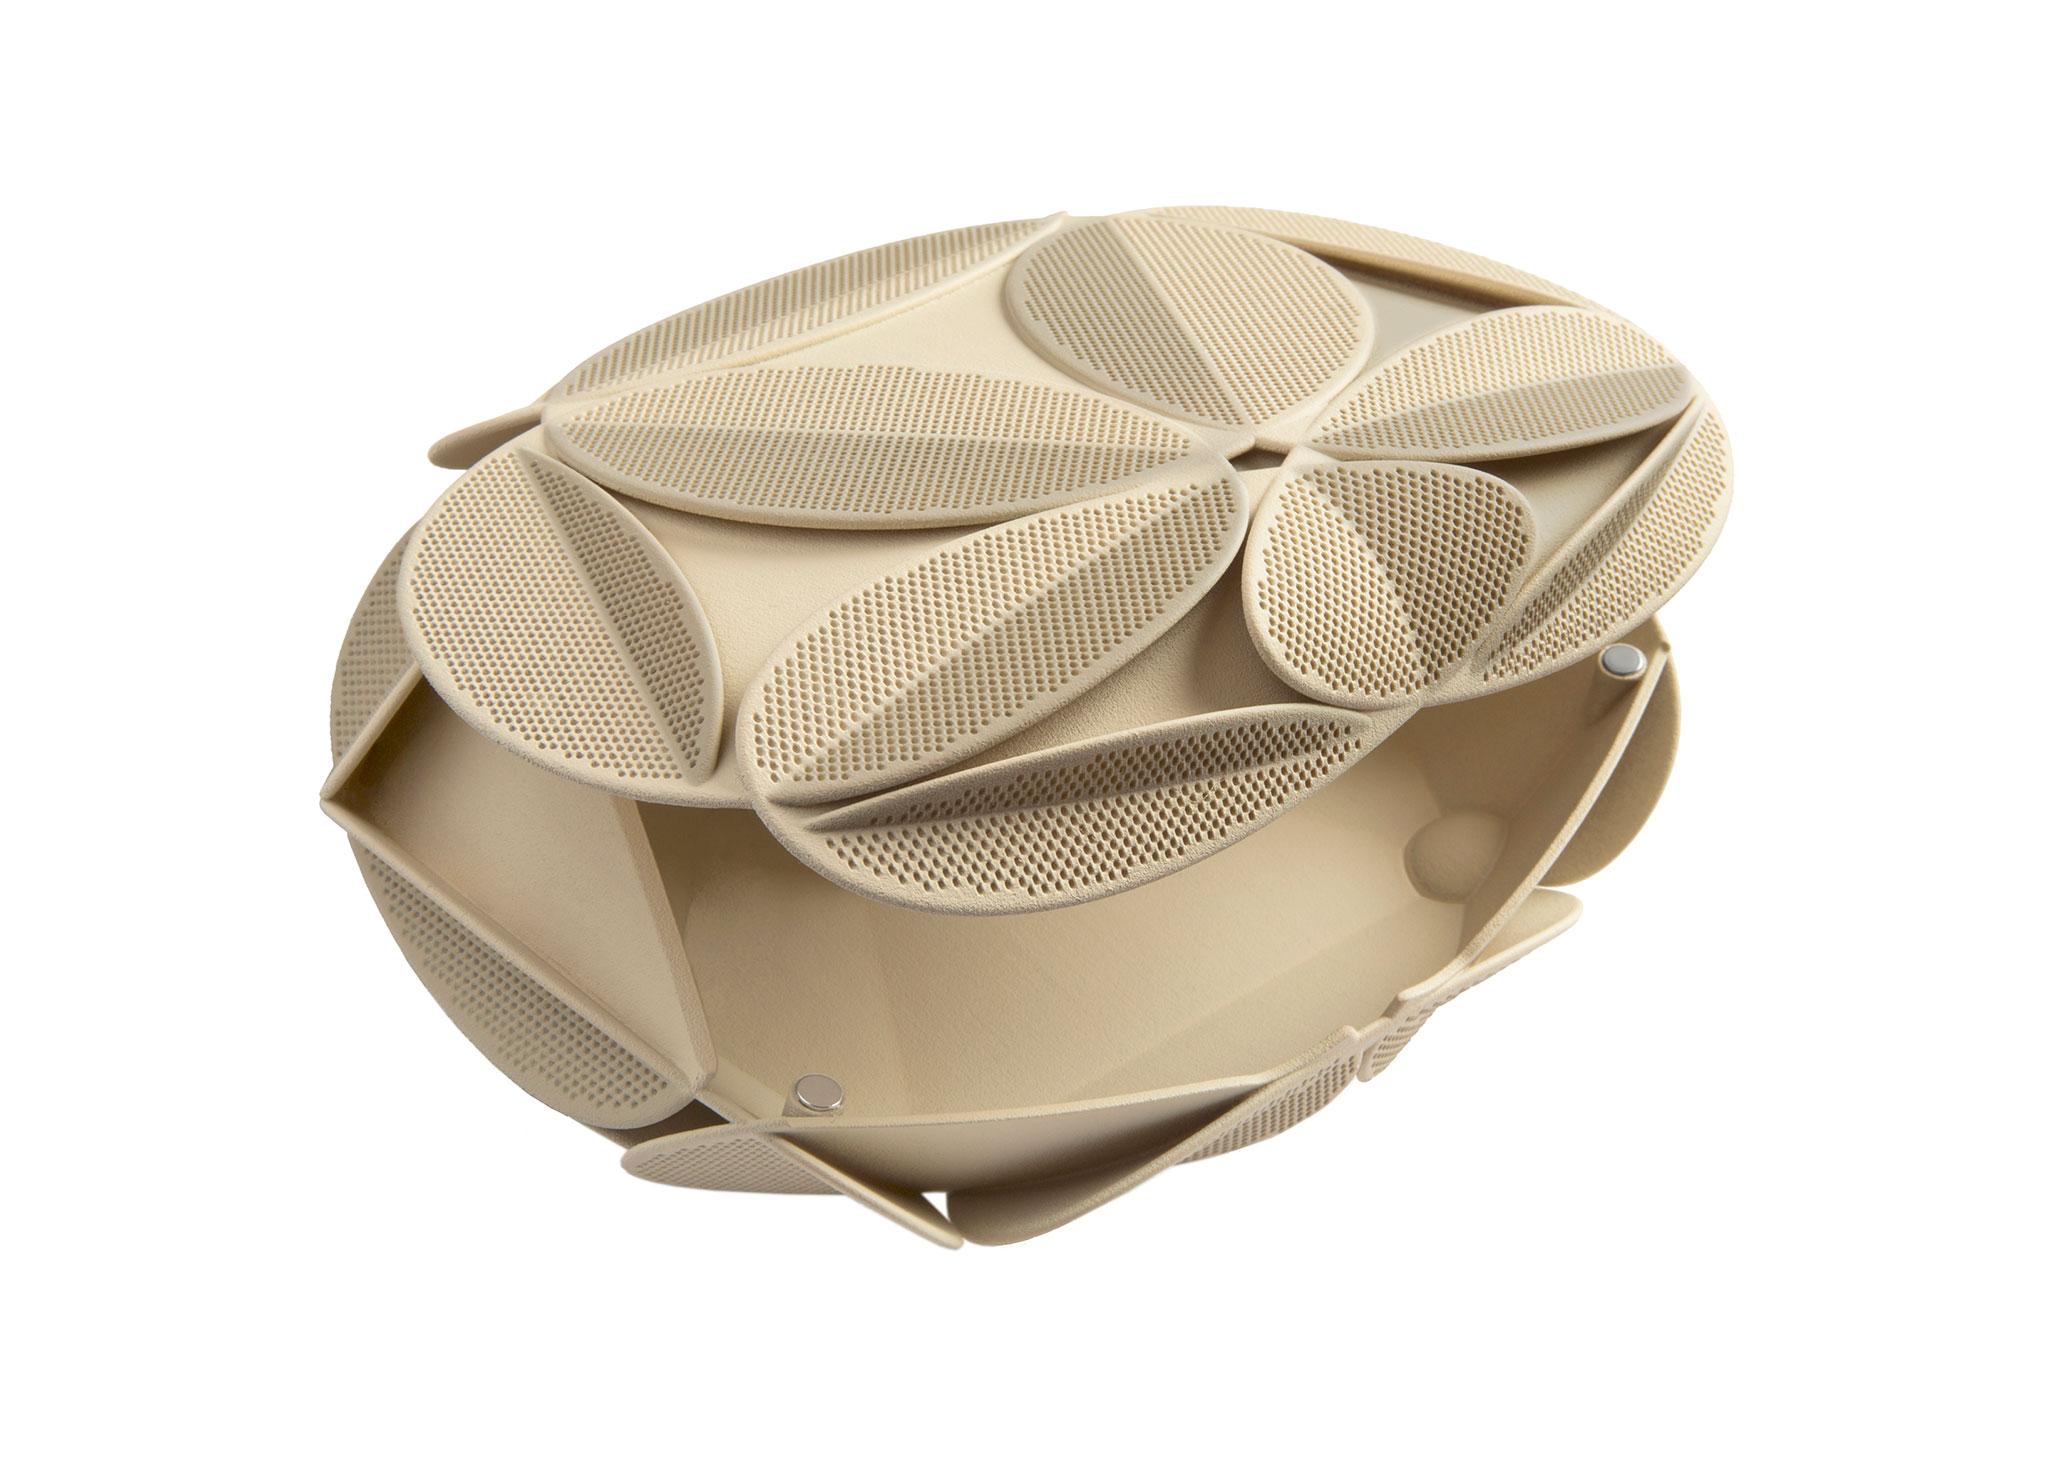 Ivy-3D-Printed-Clutch-Maison-203-07